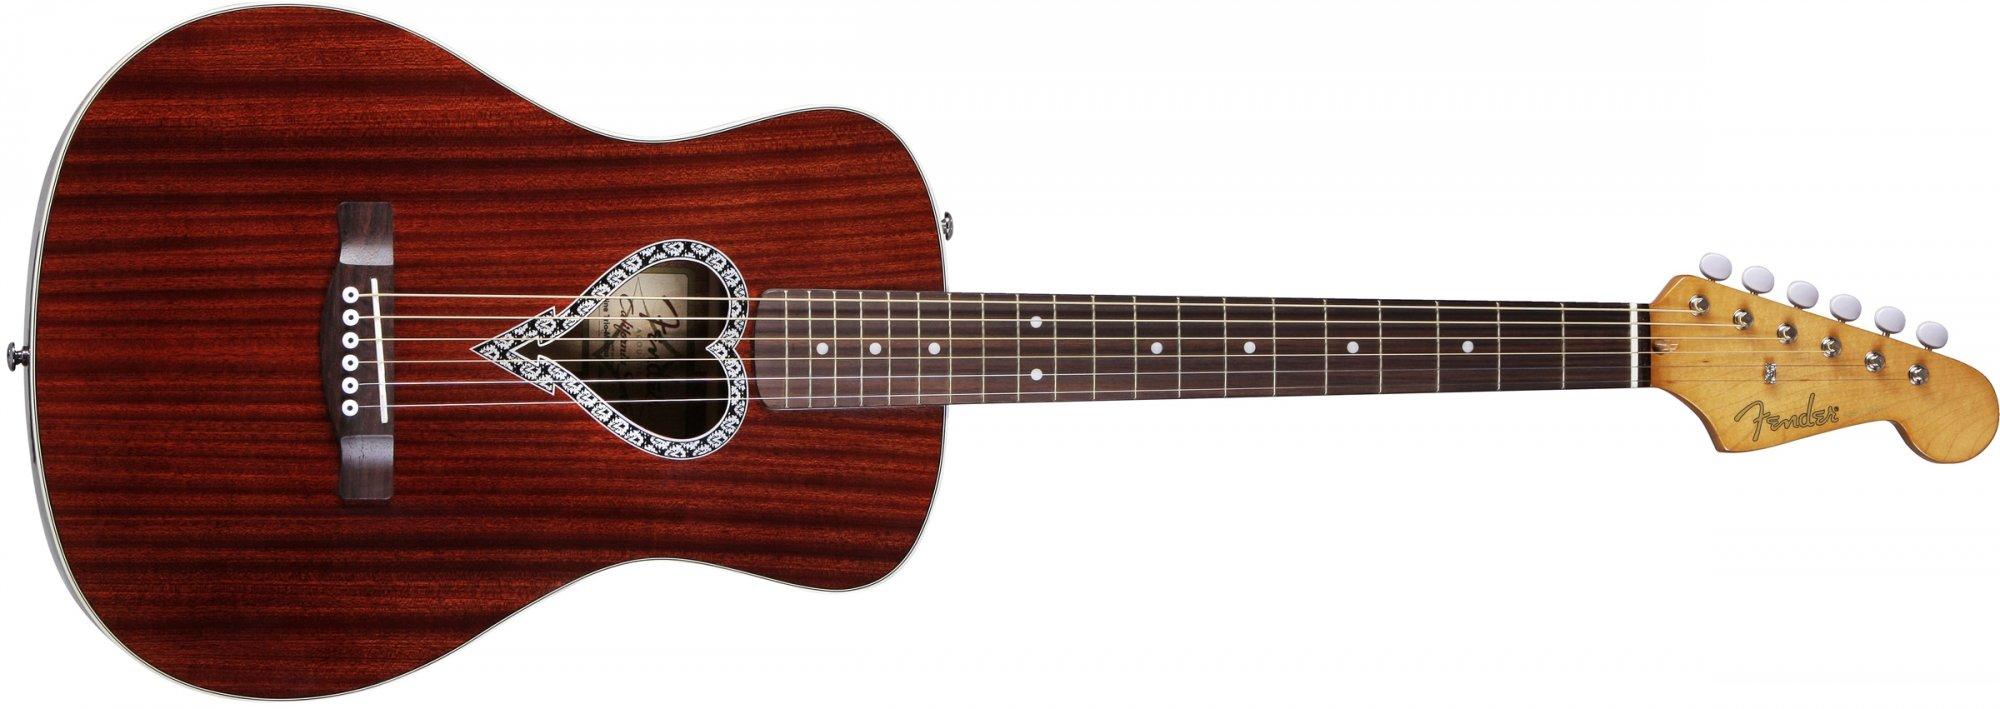 Fender Alkaline Trio Malibu Mahogany